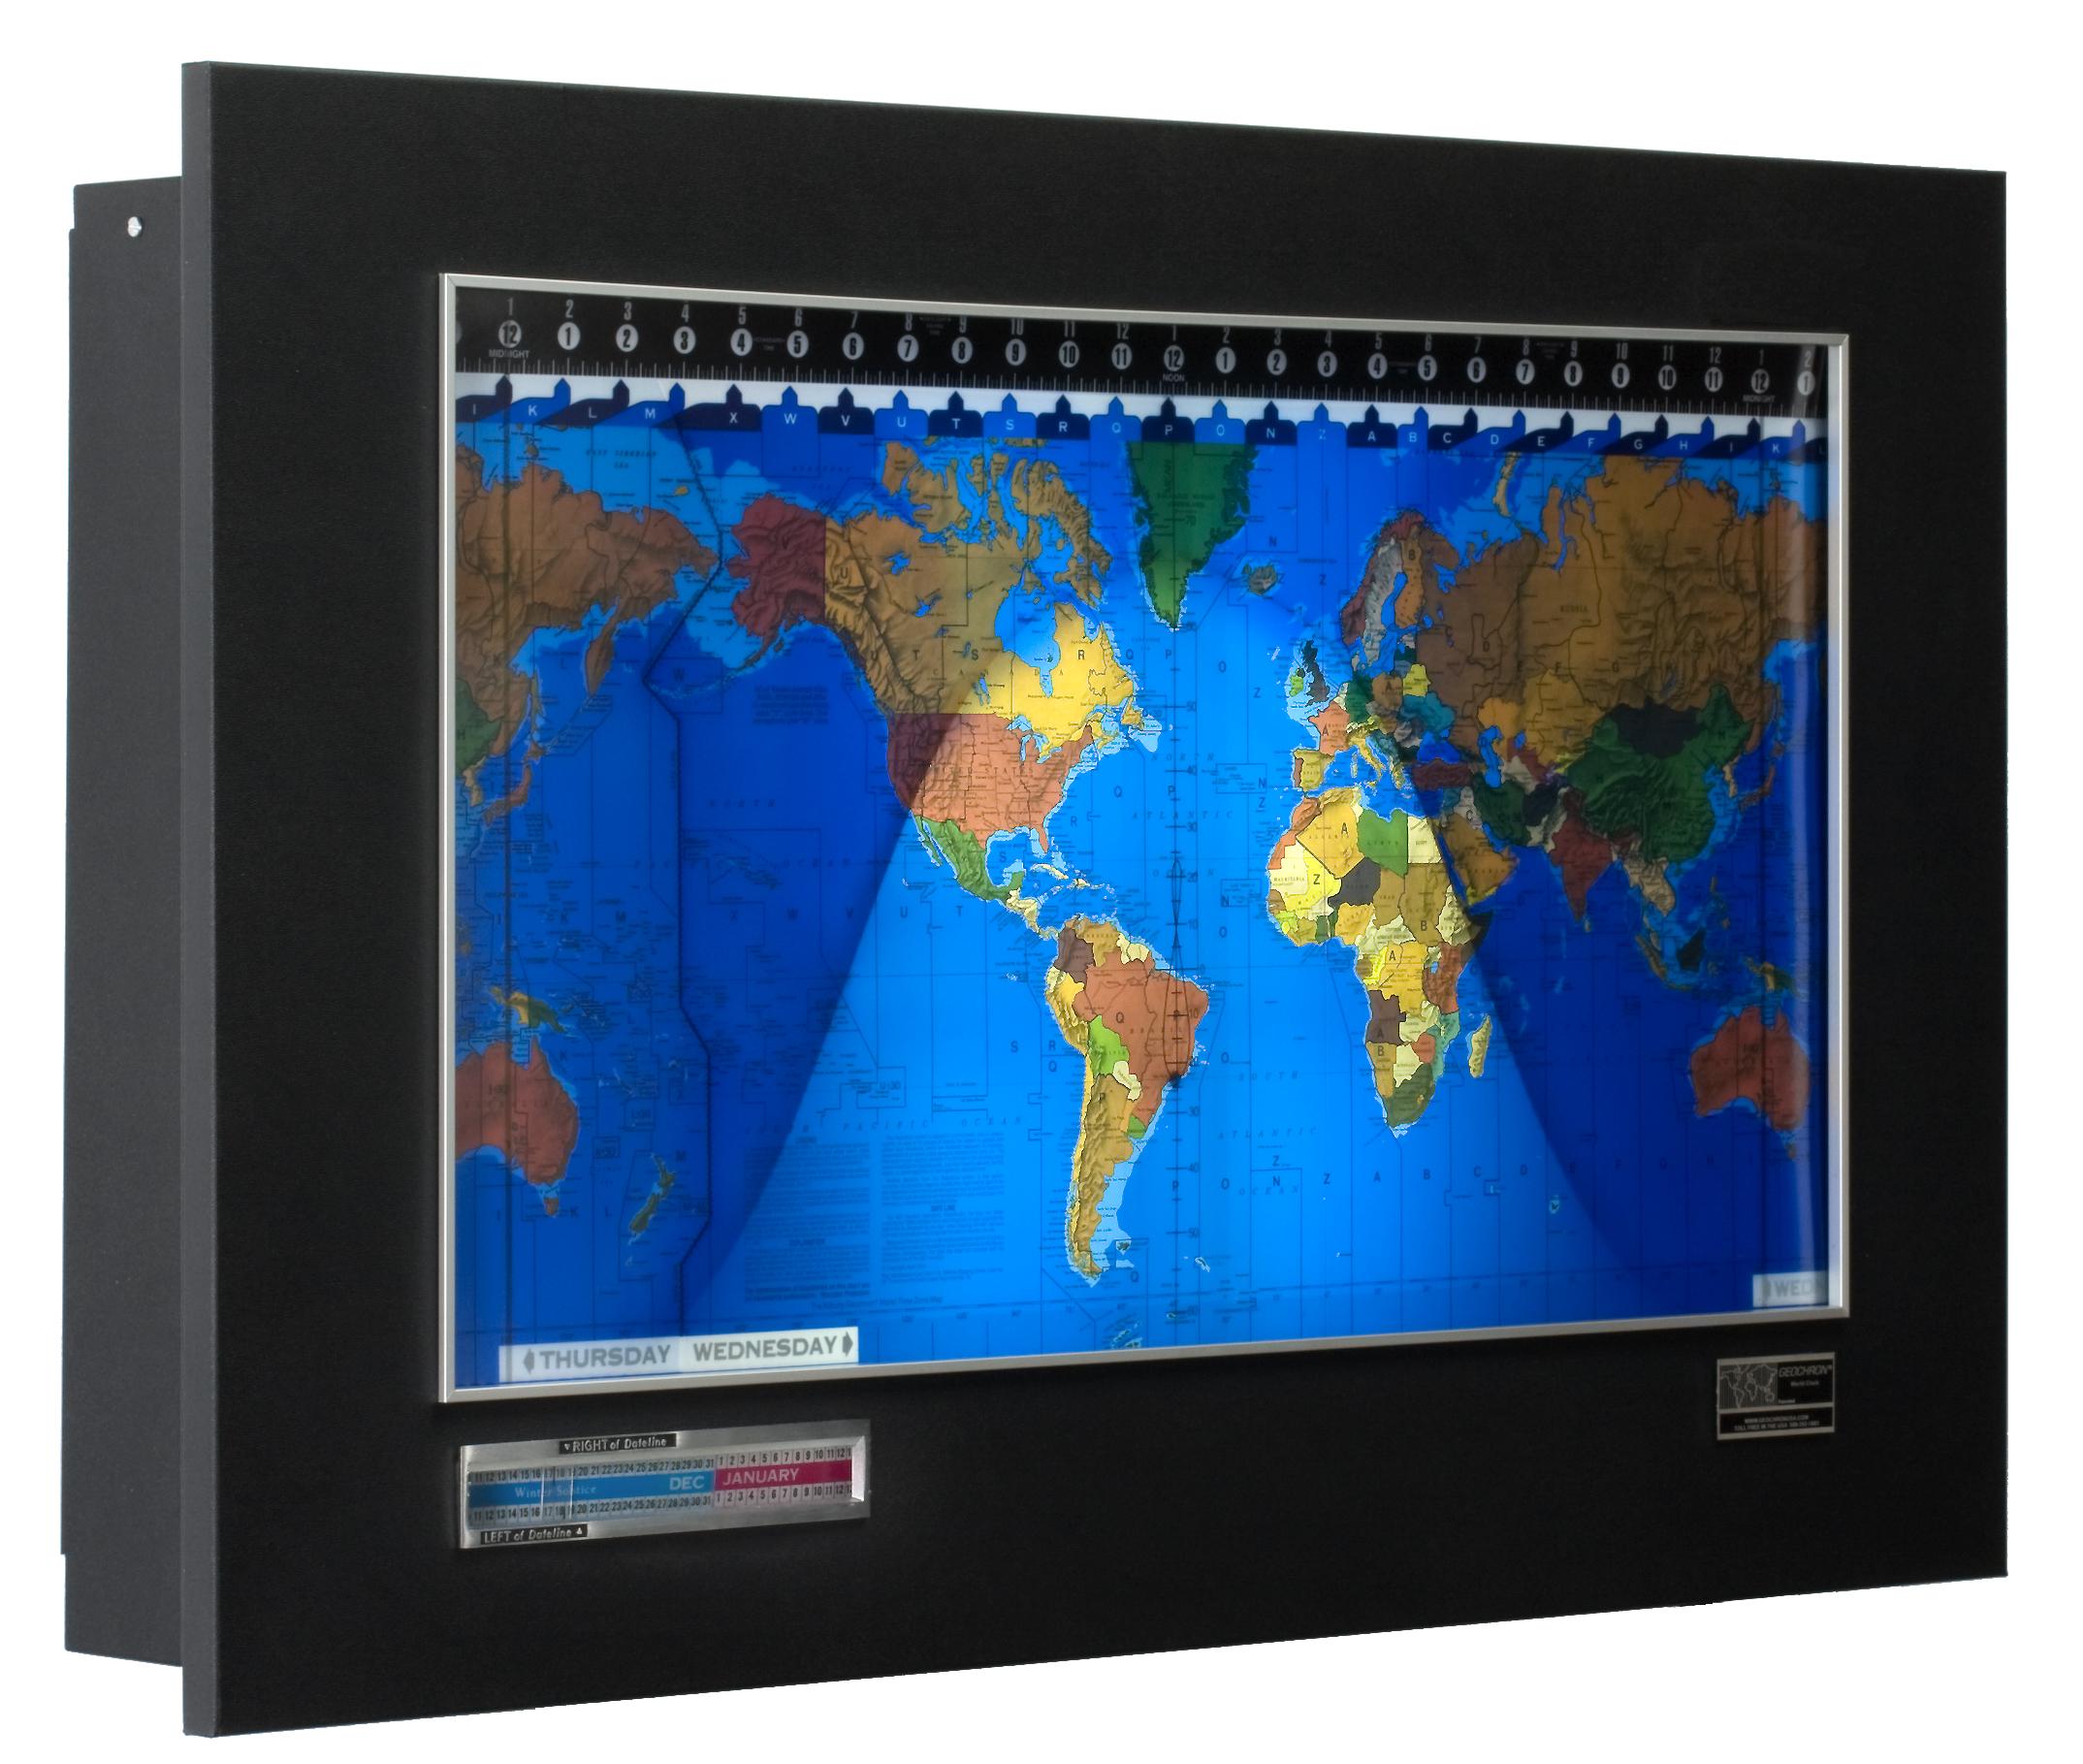 The geochron world clock for ham radio geochron standard with blacksilver panel gumiabroncs Image collections